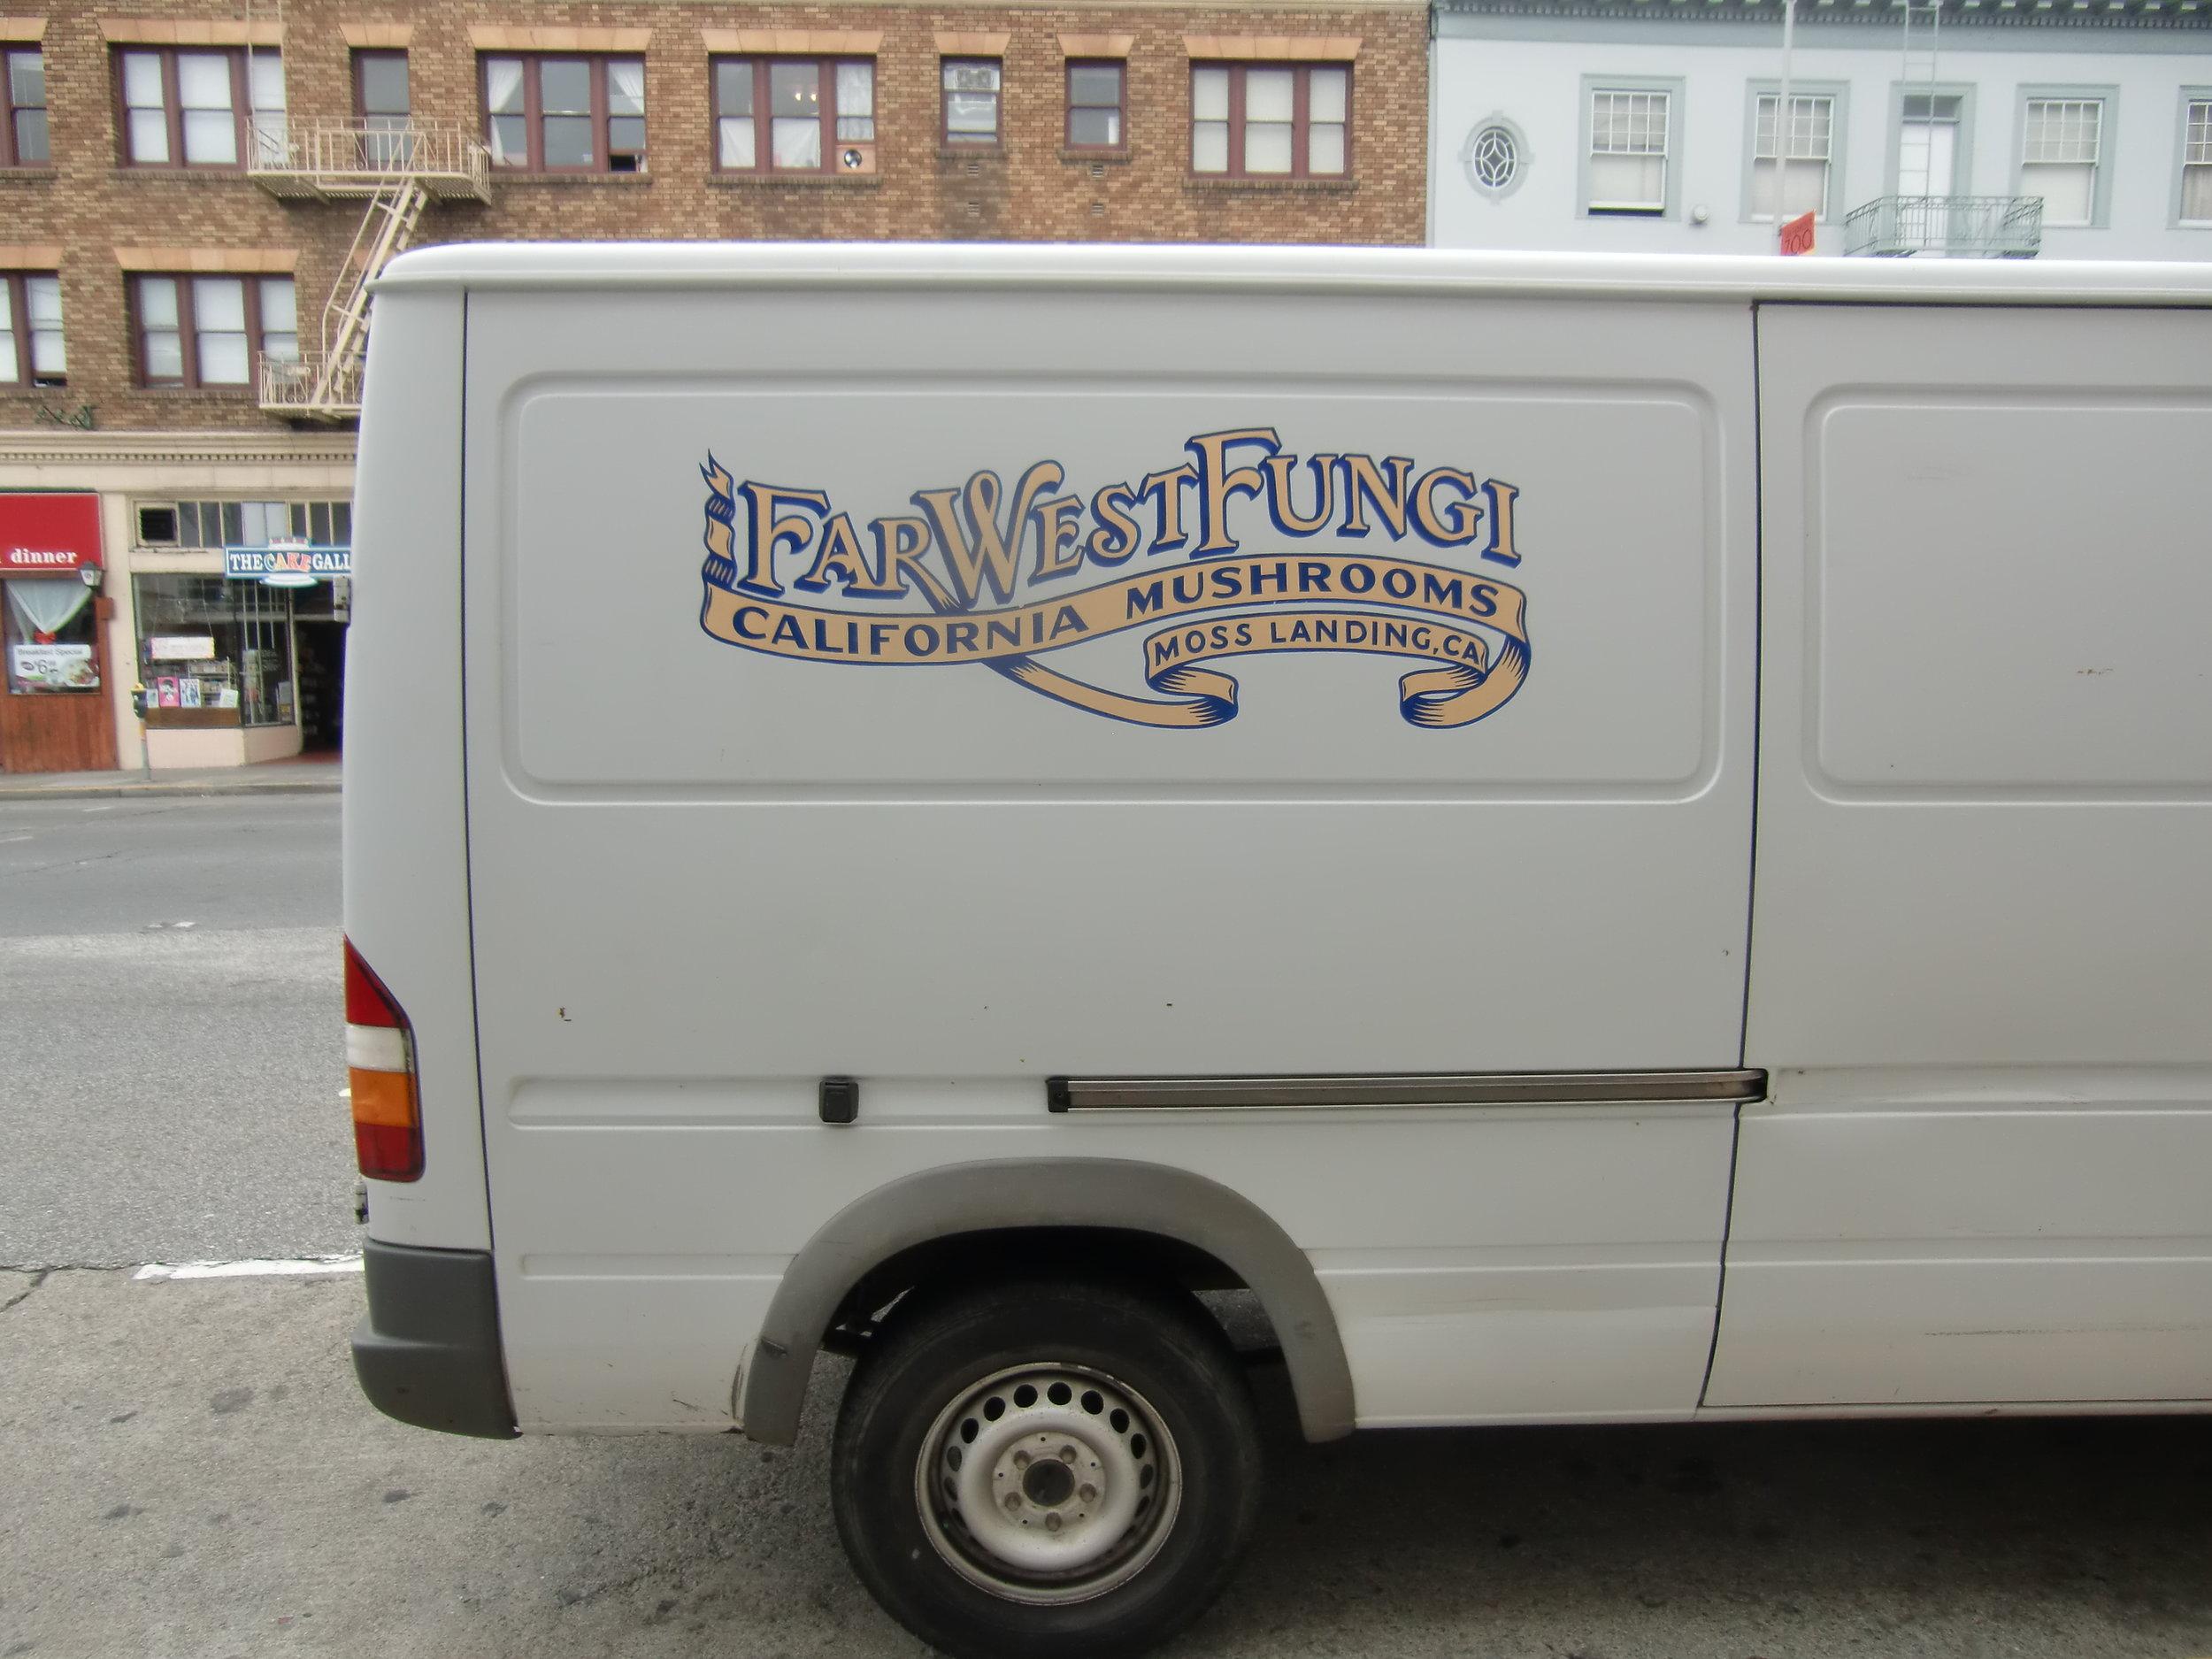 ORIG-far-west-fungi-delivery-van_5959426868_o.jpg